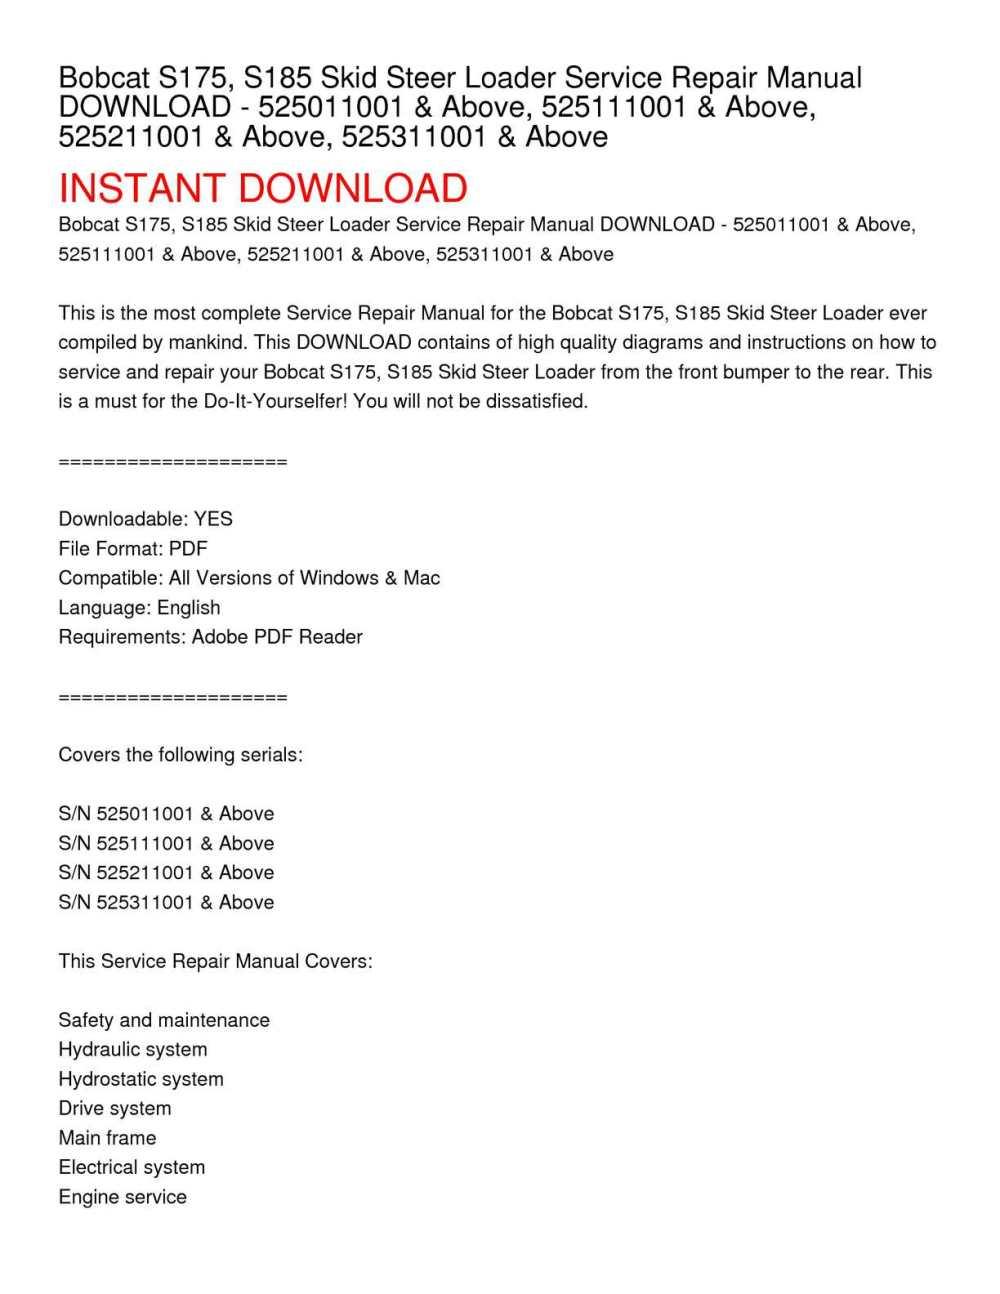 medium resolution of calam o bobcat s175 s185 skid steer loader service repair manual download 525011001 above 525111001 above 525211001 above 525311001 above